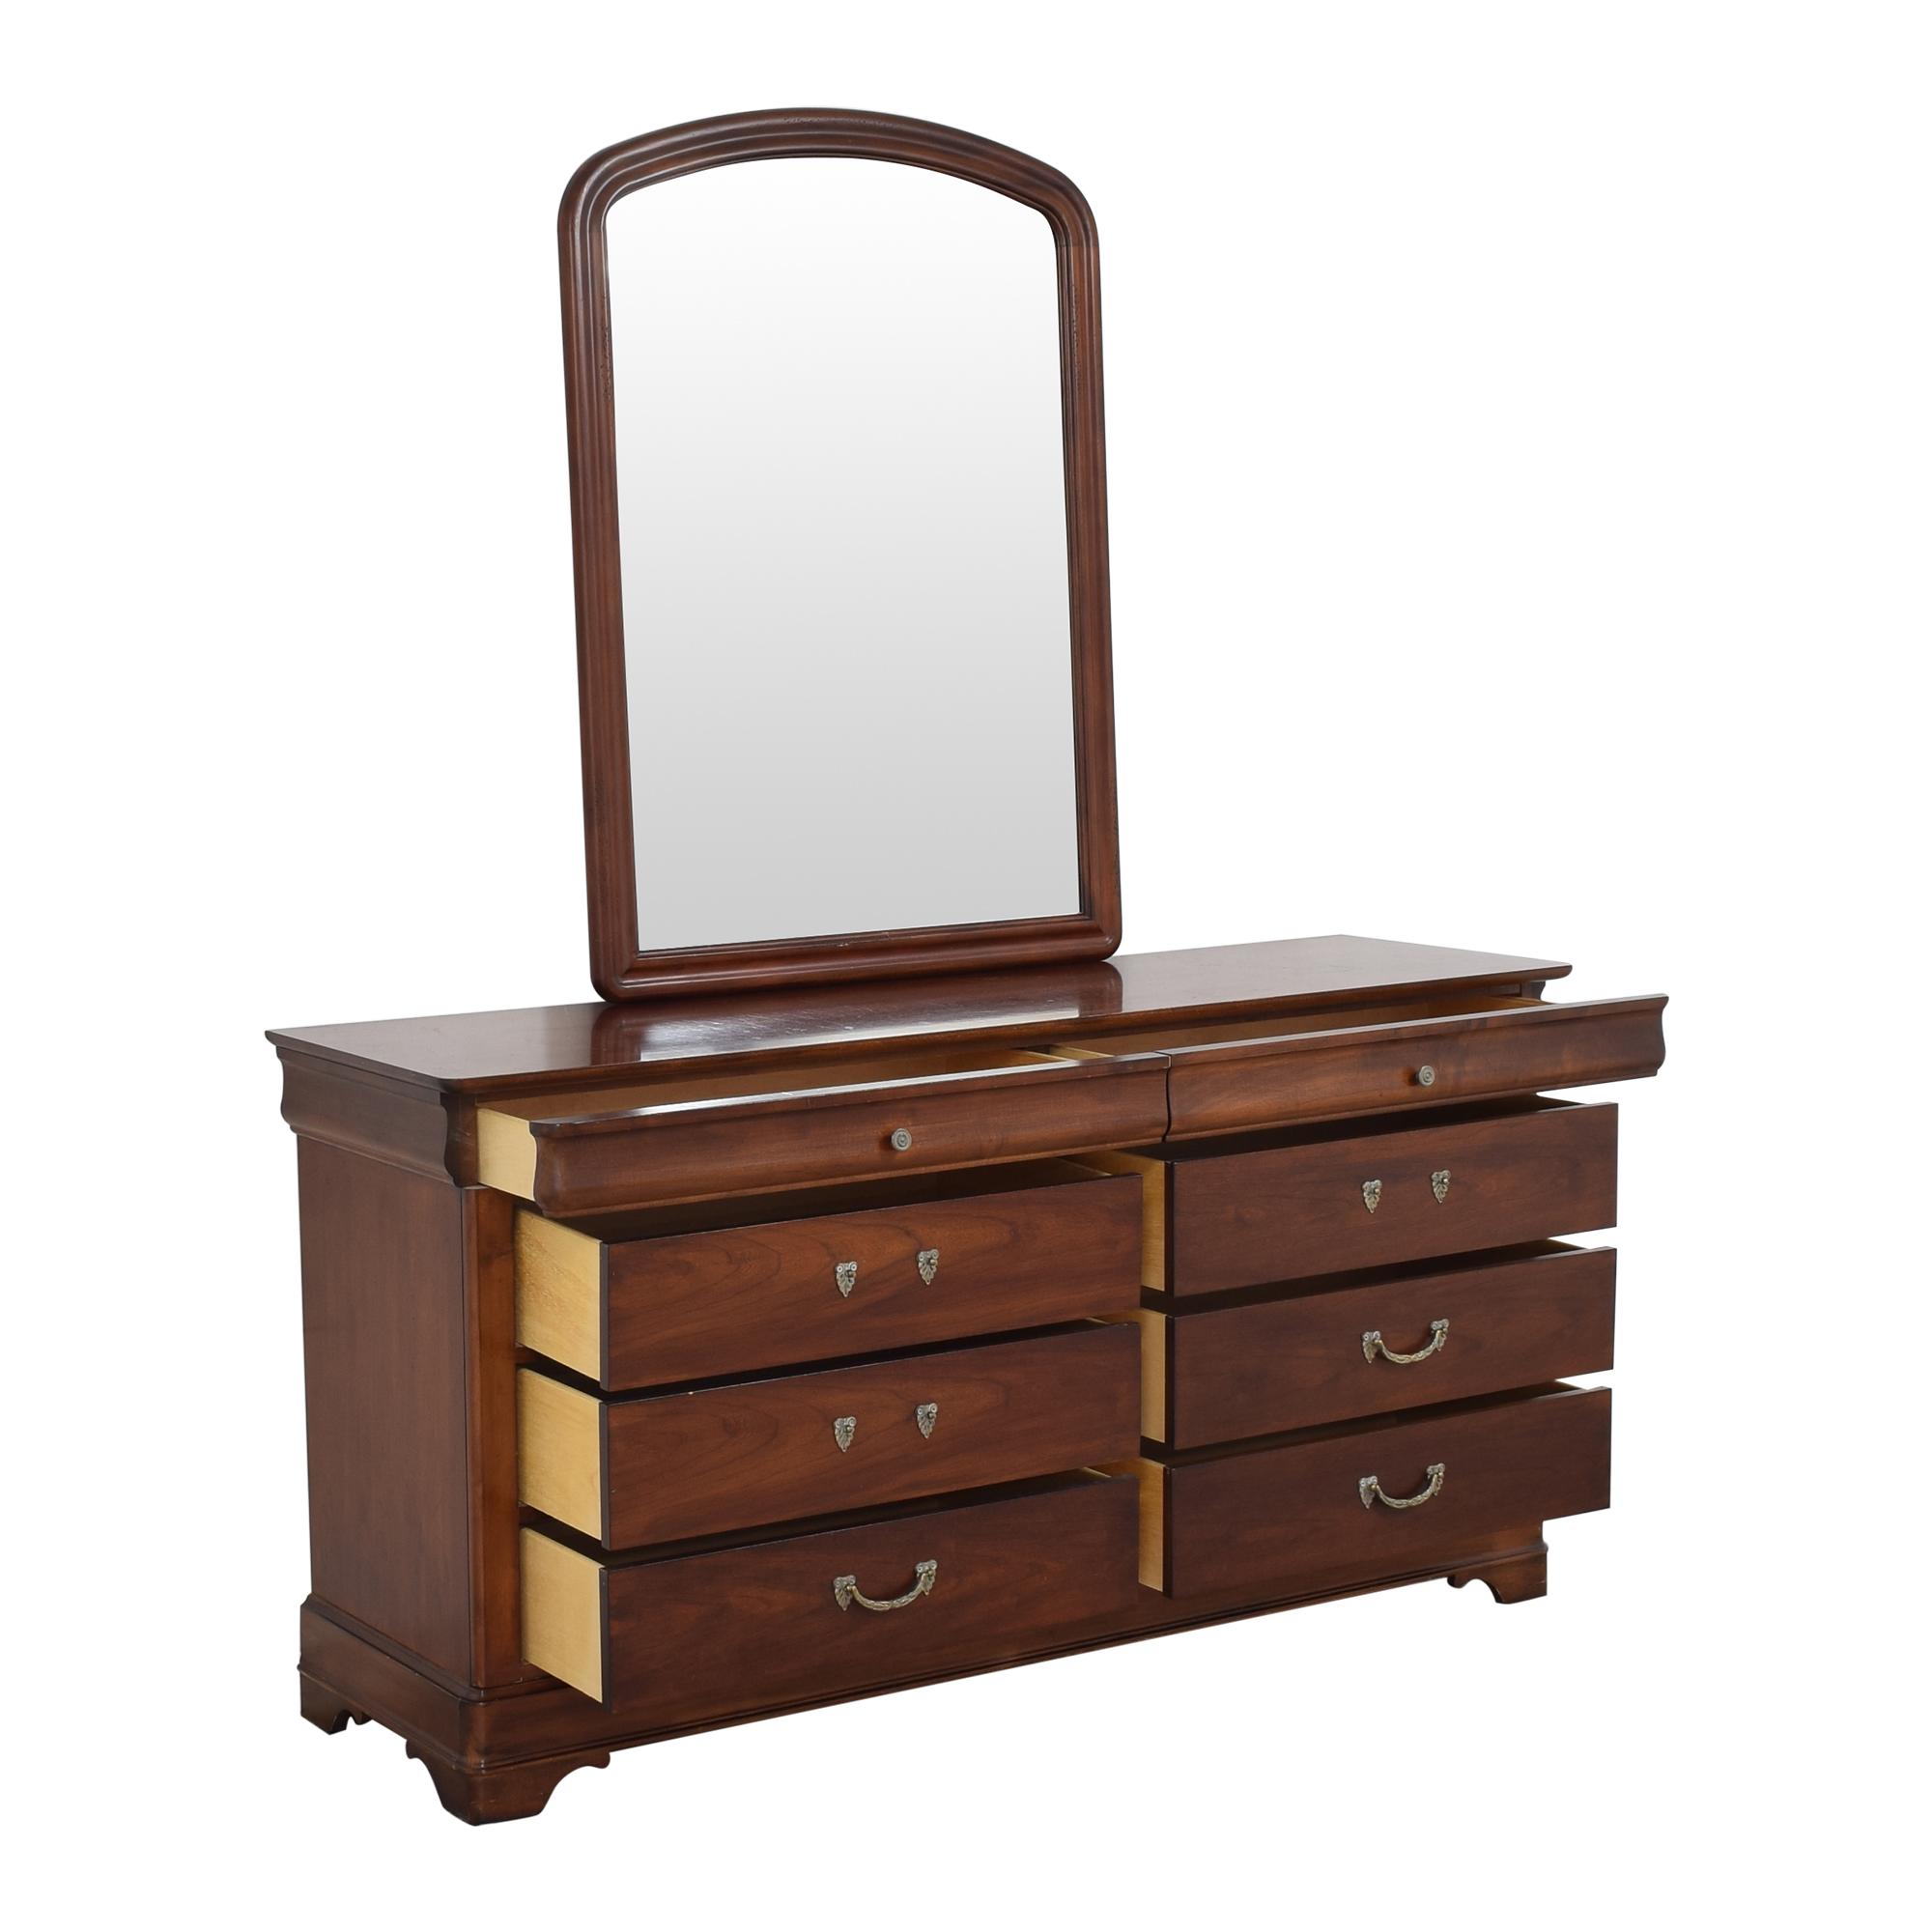 buy Drexel Heritage Delshire Double Dresser with Mirror Drexel Heritage Storage